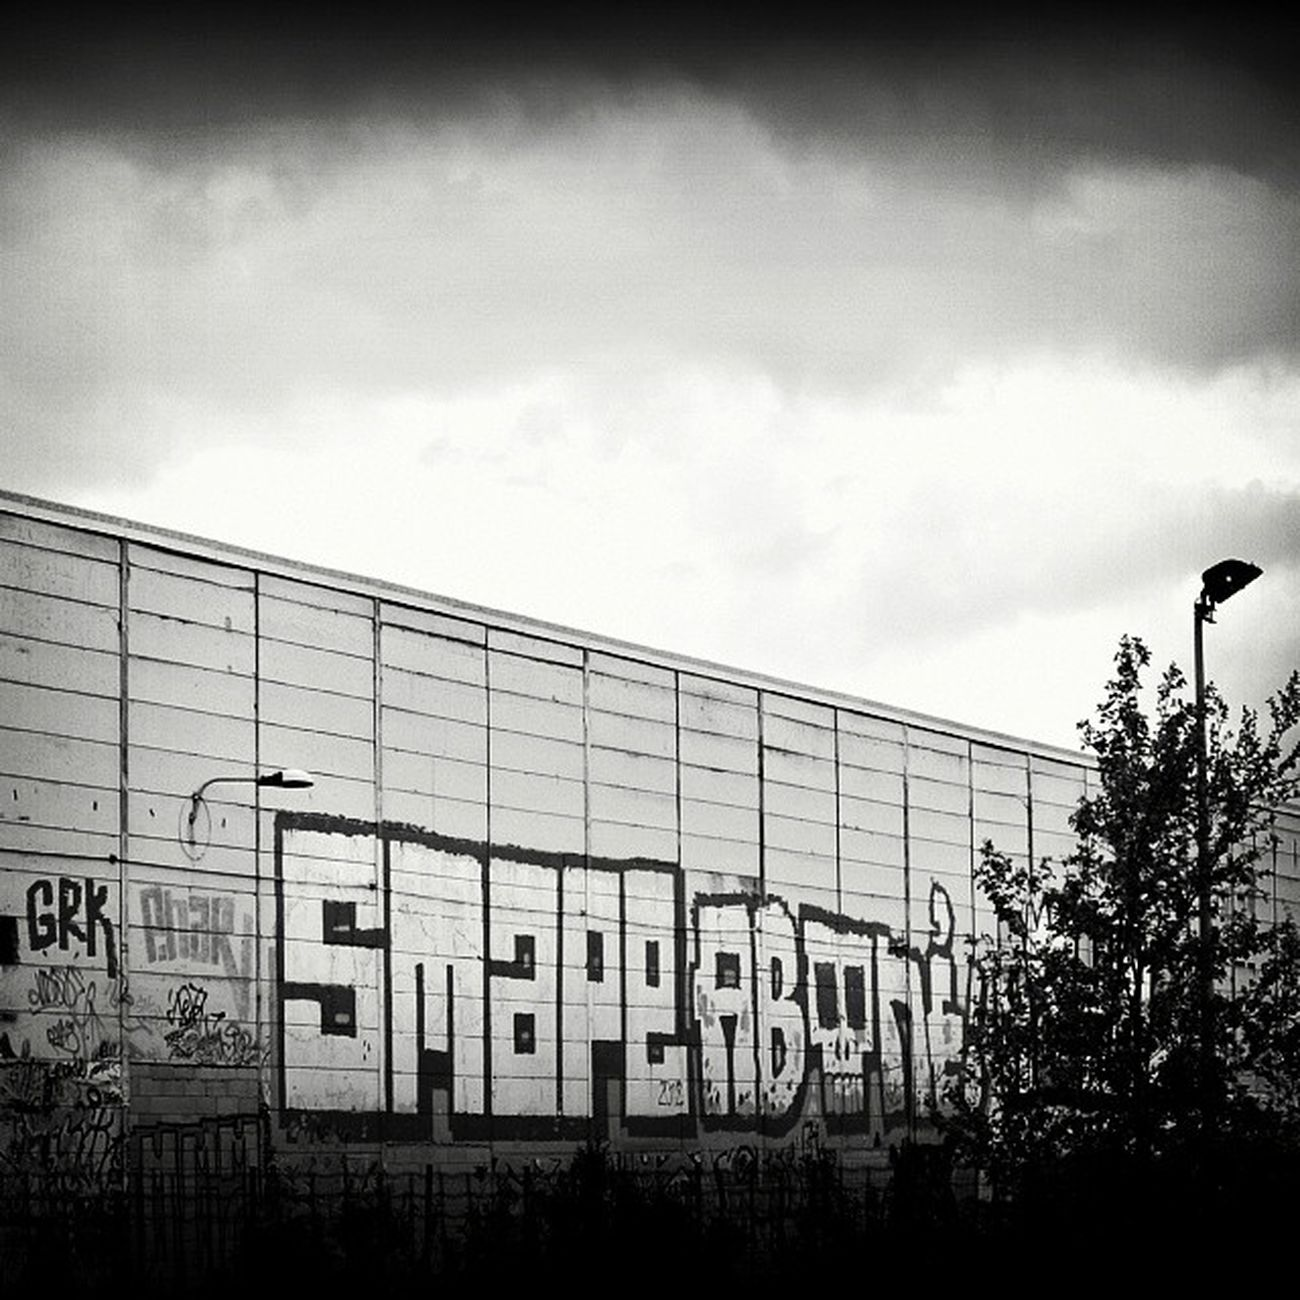 Smape Abone Hangar Lanorville